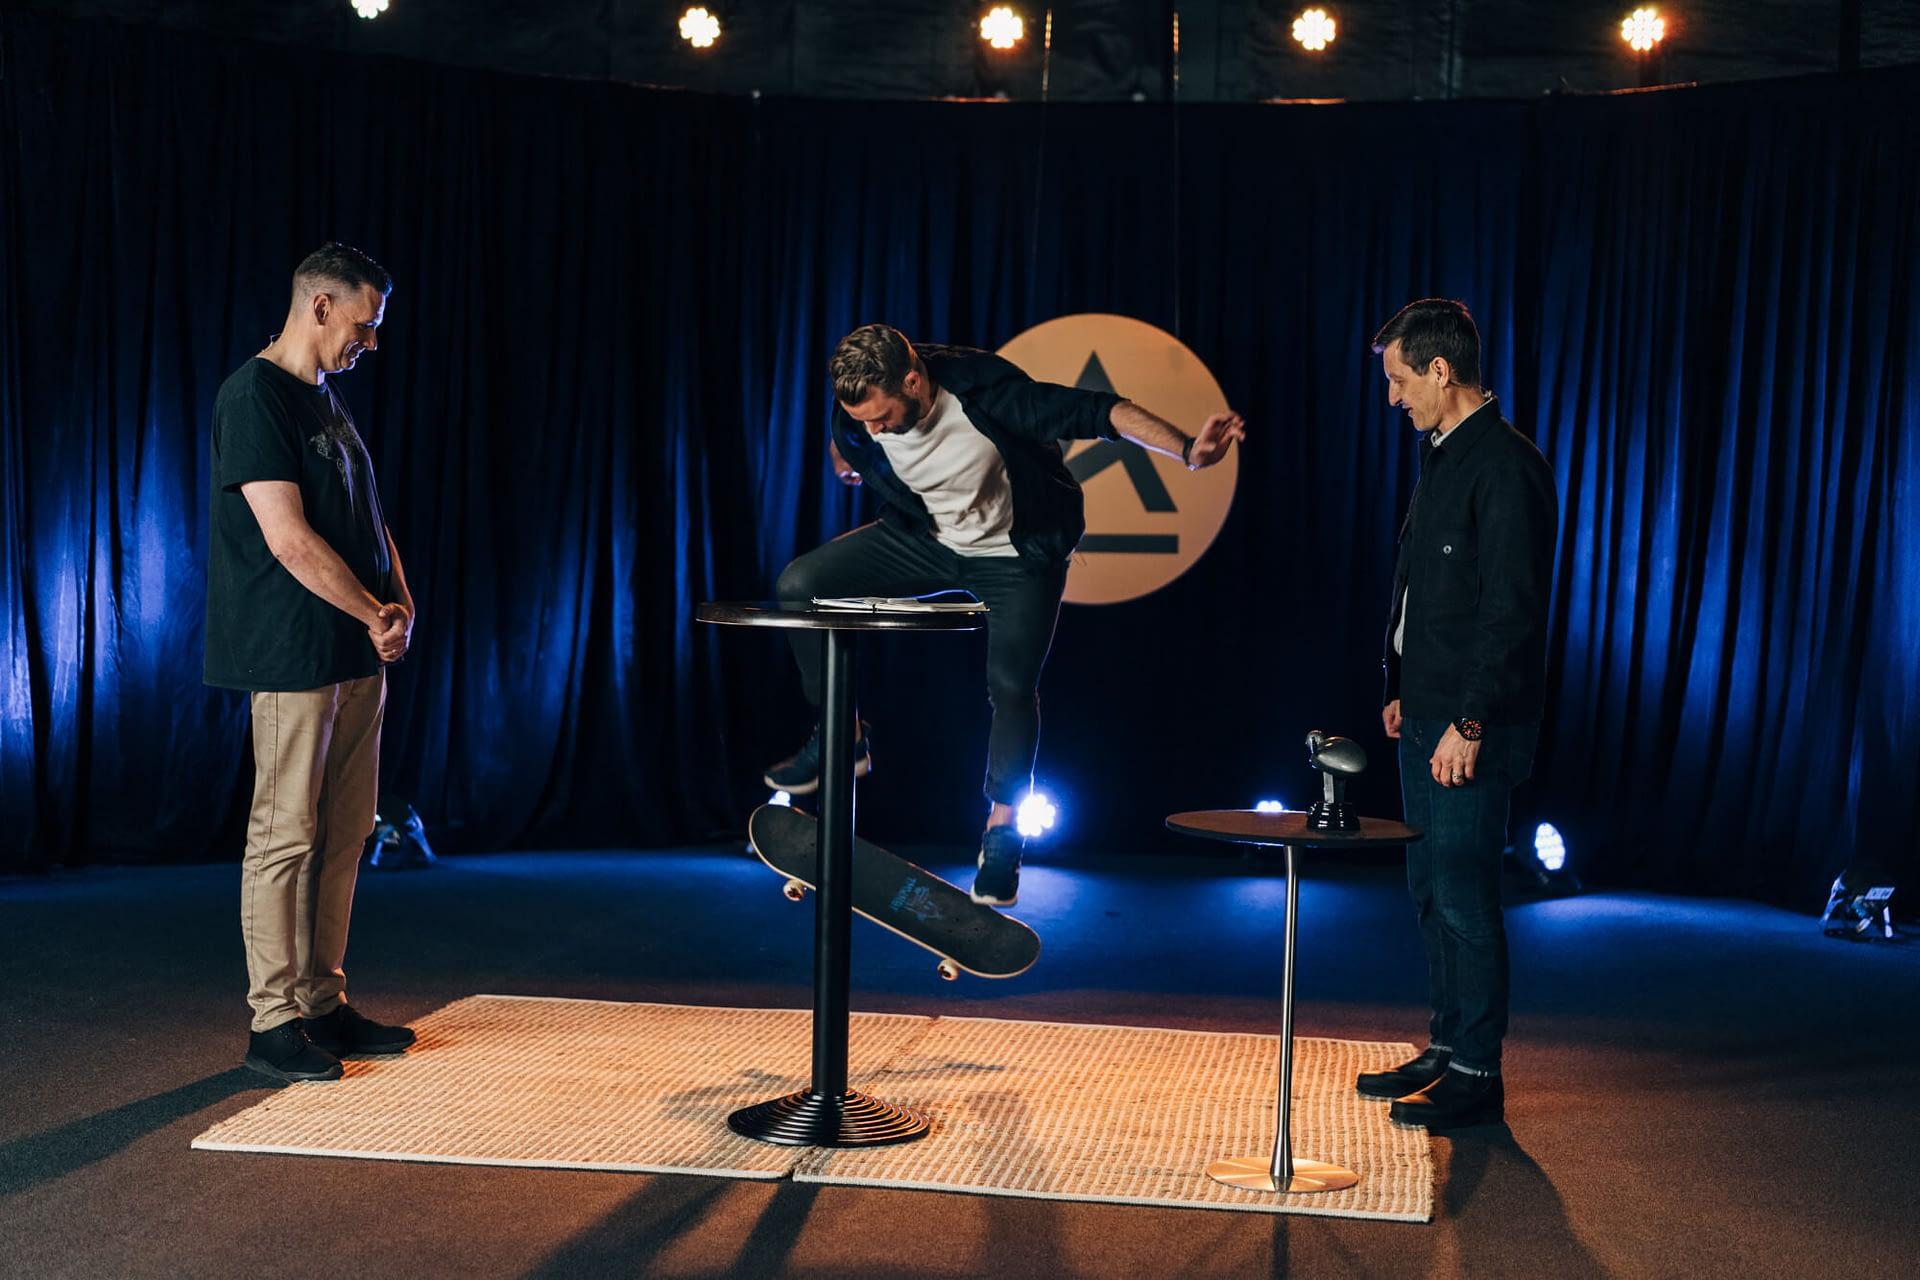 basecamp-2020-livestream-jeremy-dunne-kickflips-skateboard.jpg